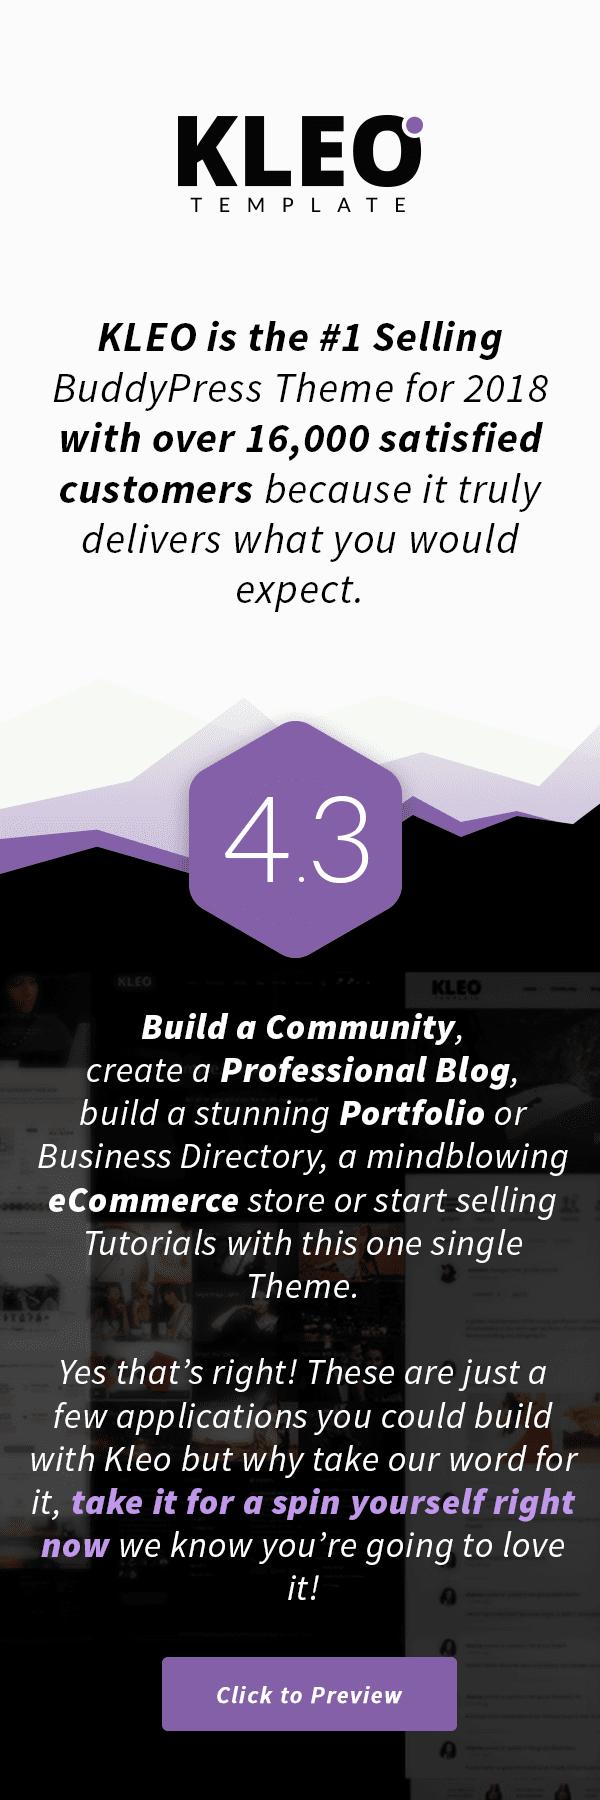 KLEO - Pro Community Focused, Multi-Purpose BuddyPress Theme - 1